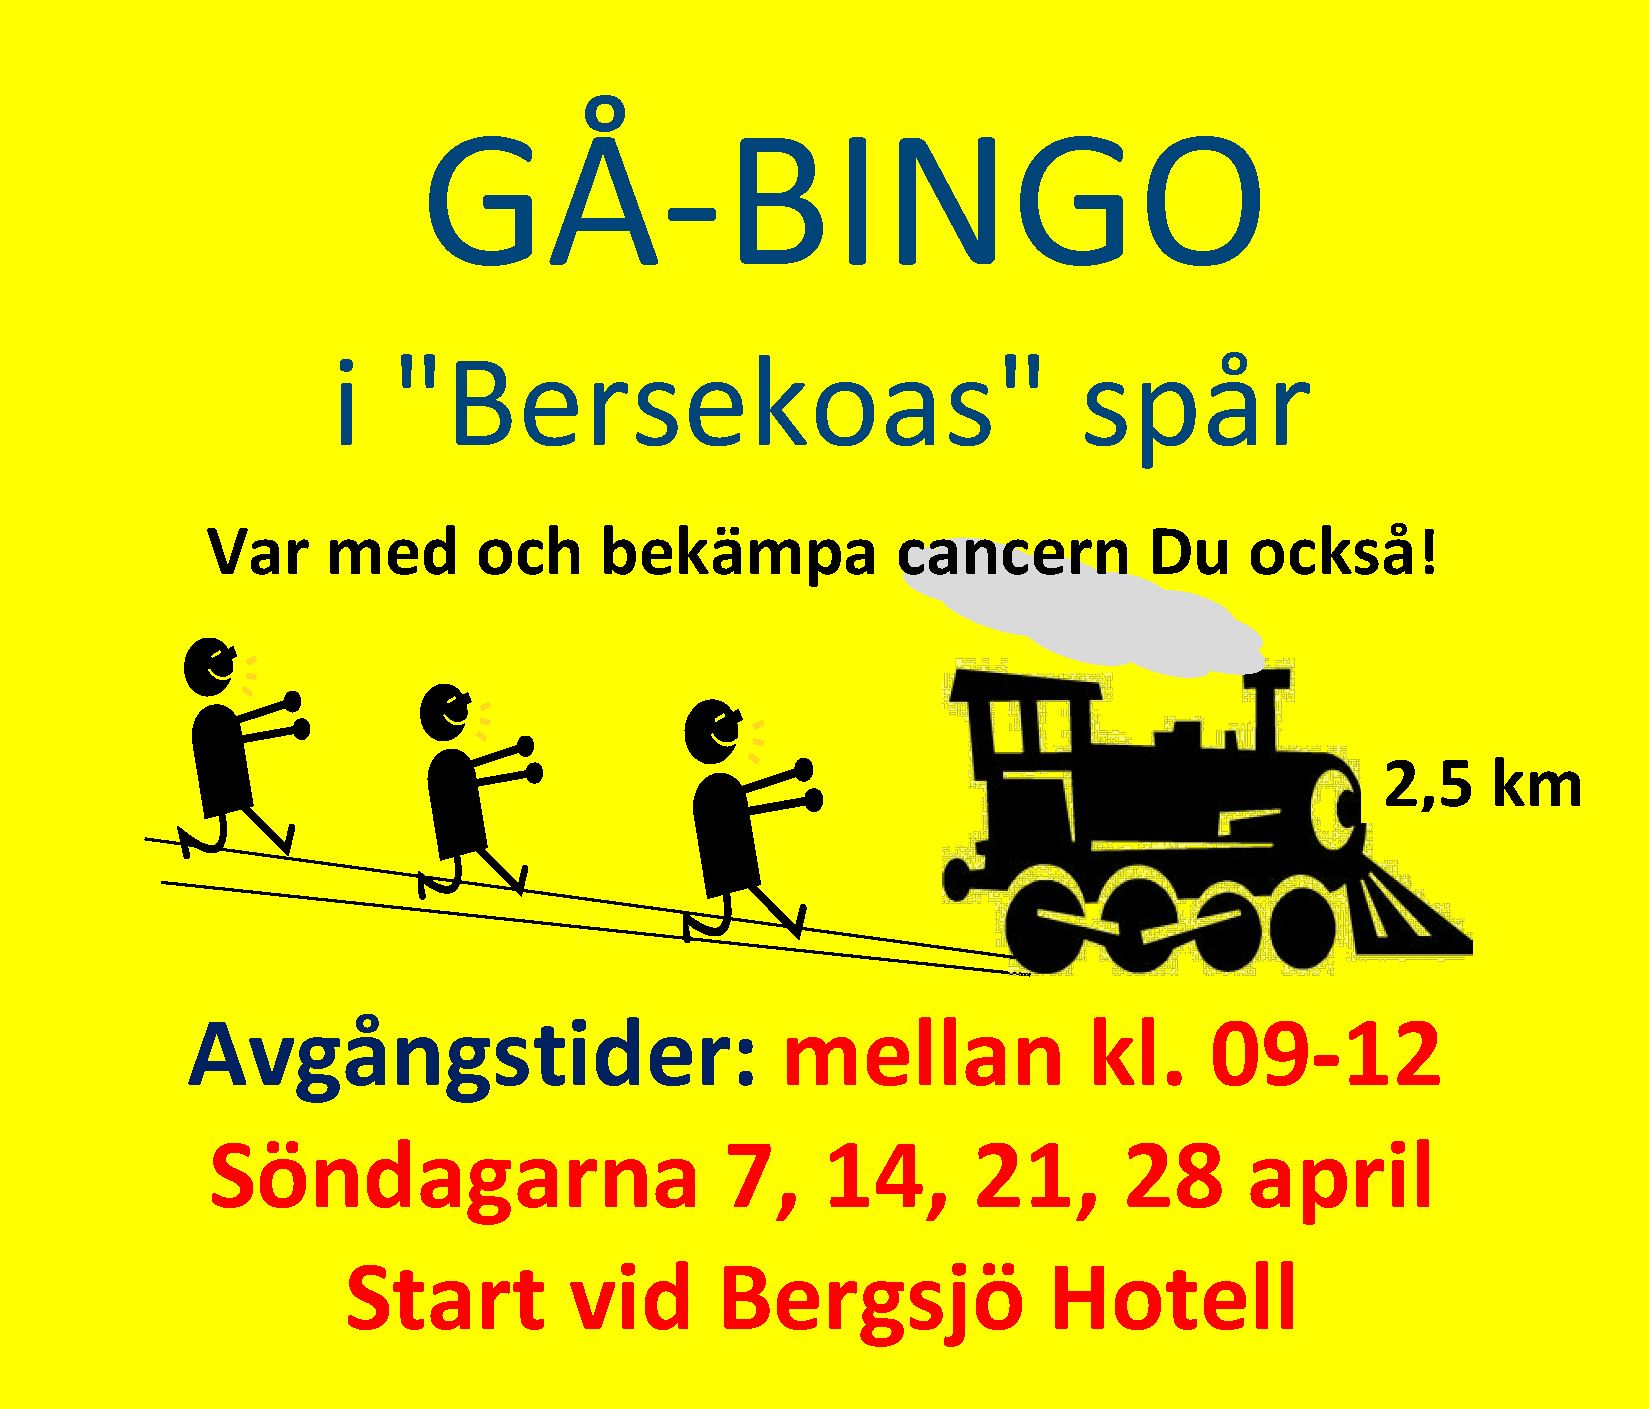 gå-bingo, bergsjö, lions club, nordanstig,  © gå-bingo, bergsjö, lions club, nordanstig, gå-bingo, bergsjö, lions club, nordanstig